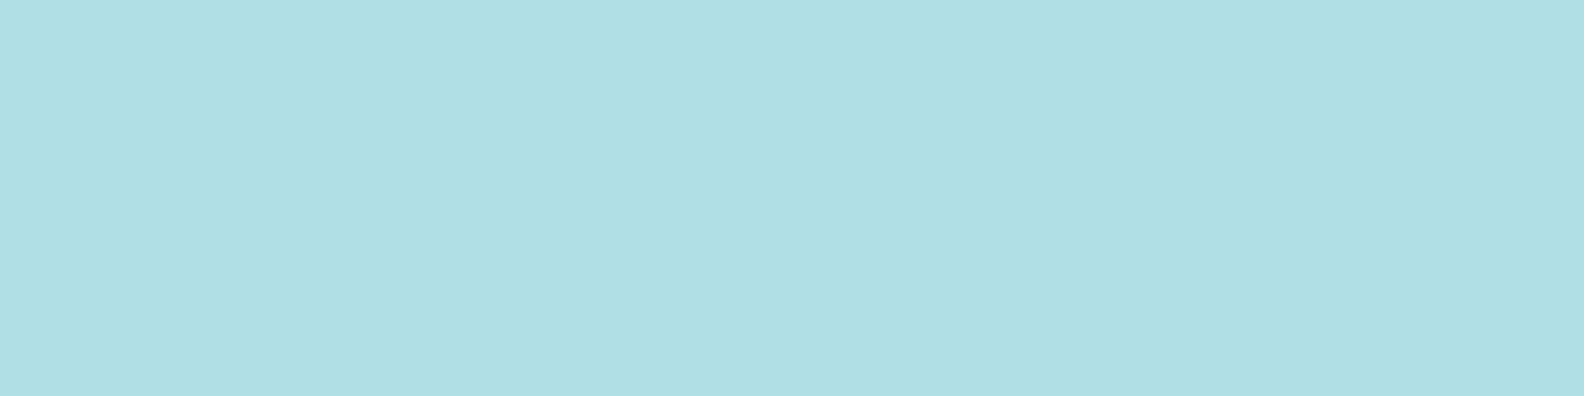 1584x396 Powder Blue Web Solid Color Background